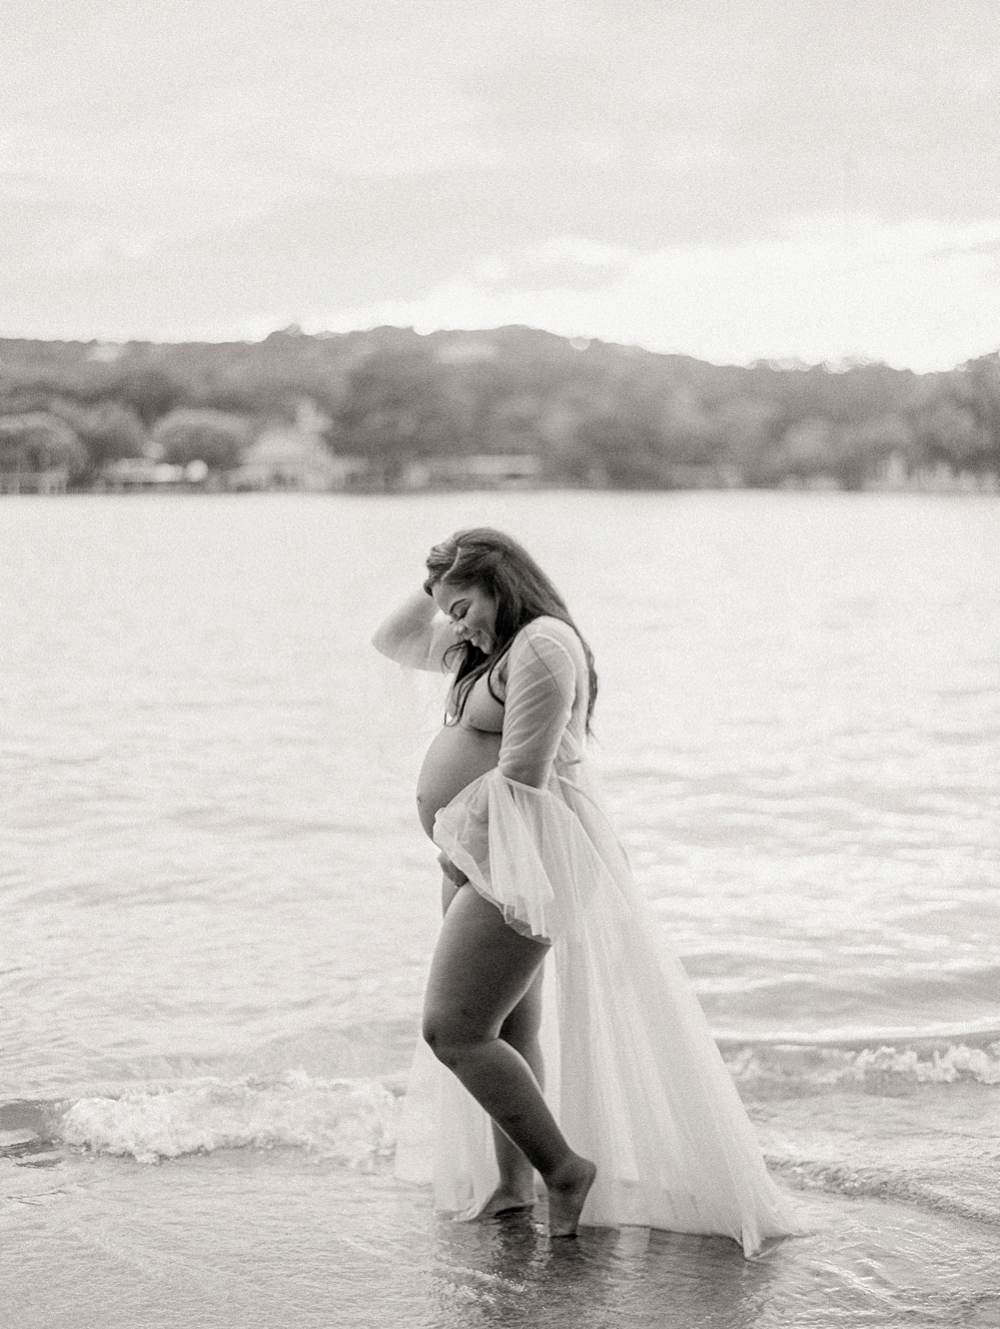 kristin-la-voie-photography-Maternity-Laguna-Gloria-Austin-Photographer-54